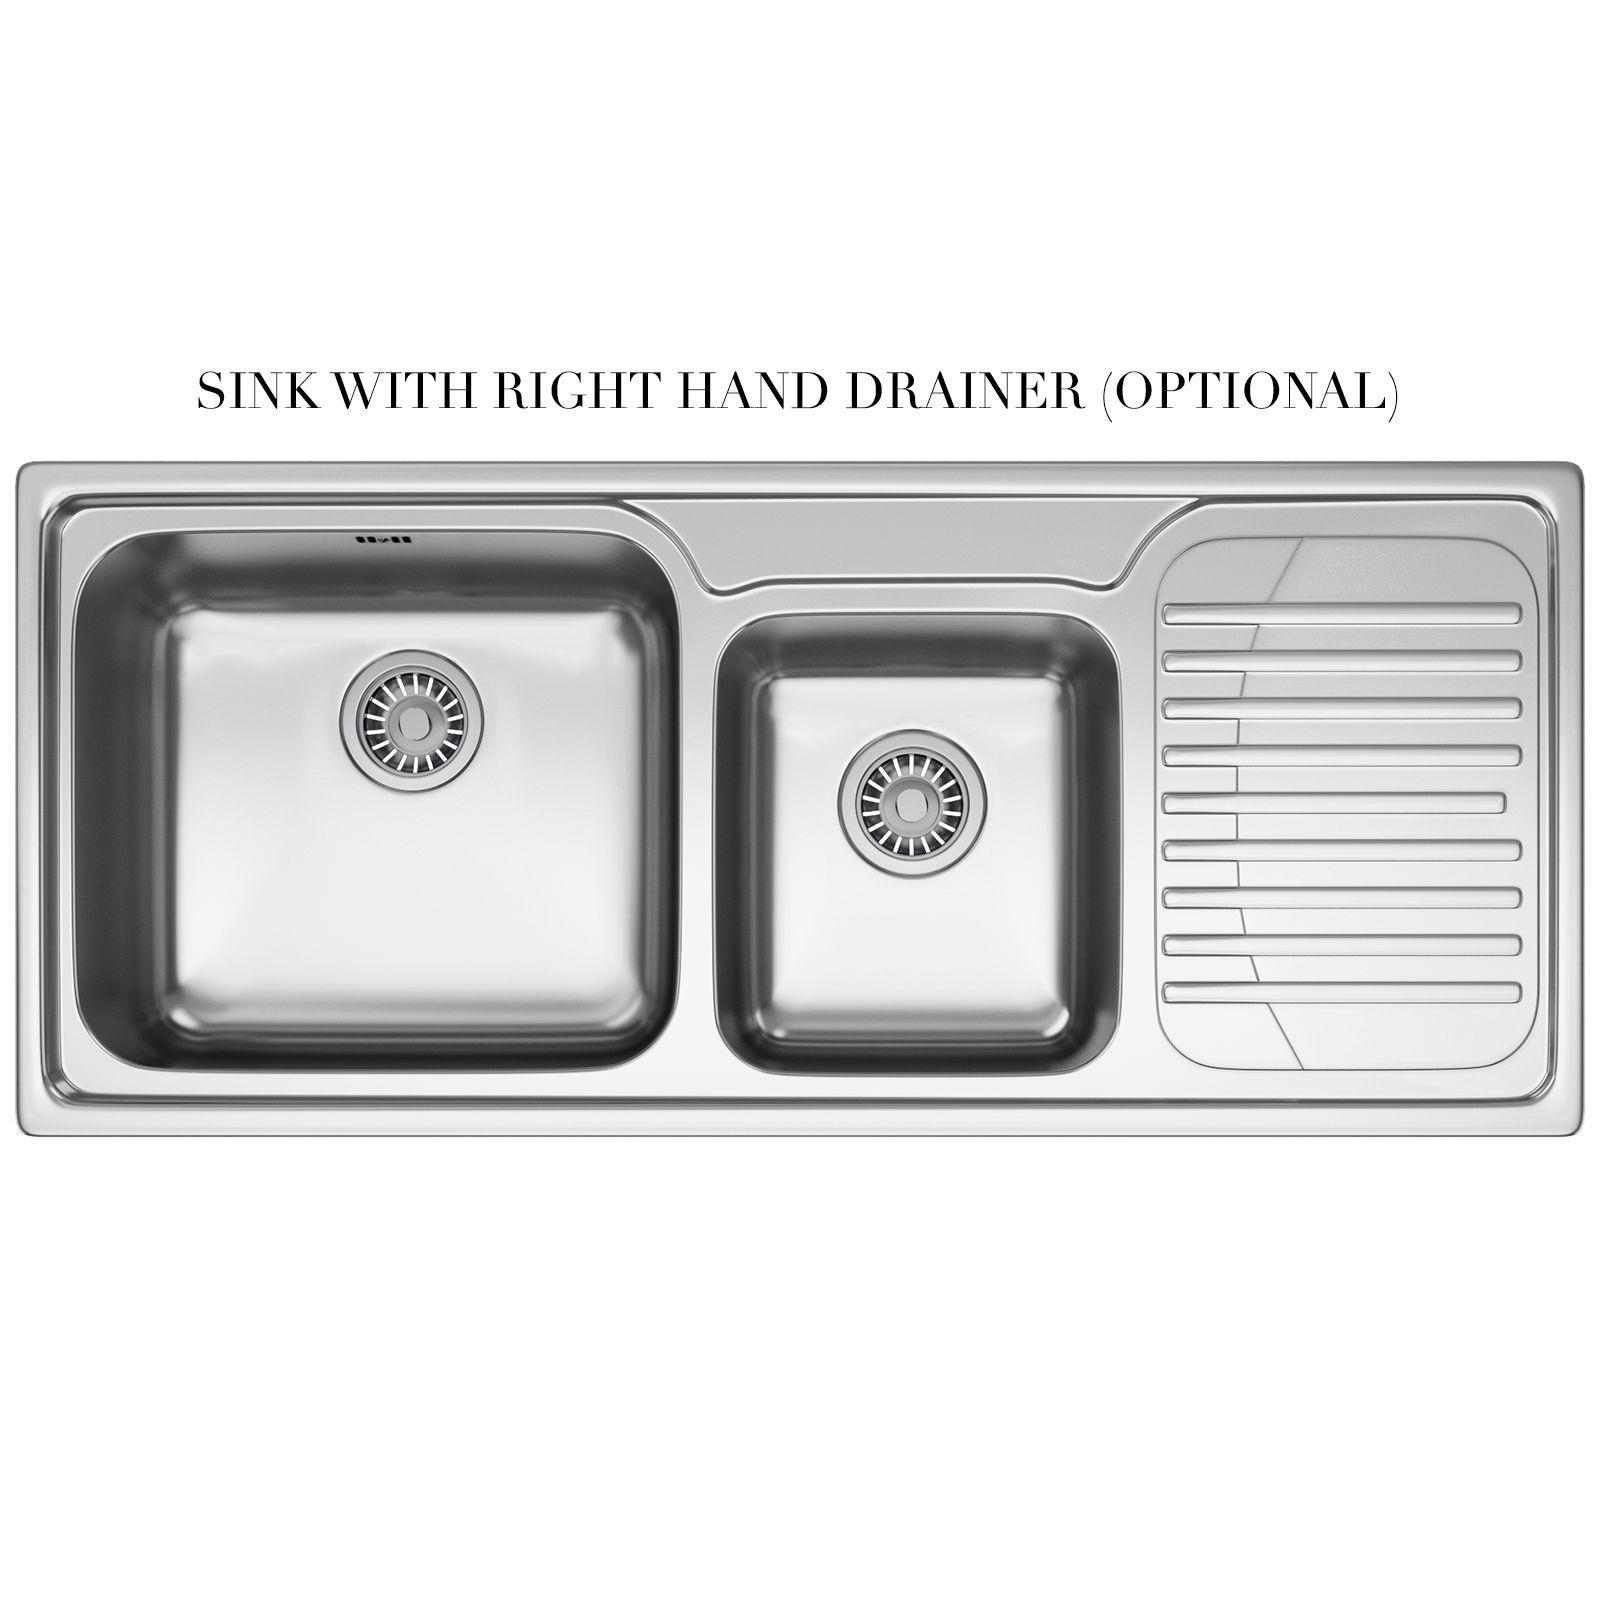 Franke Galassia Gax 621 1 5 Bowl Stainless Steel Inset Sink 1010068483 Bom Franke Kitchen Sinks Franke Sink Inset Sink